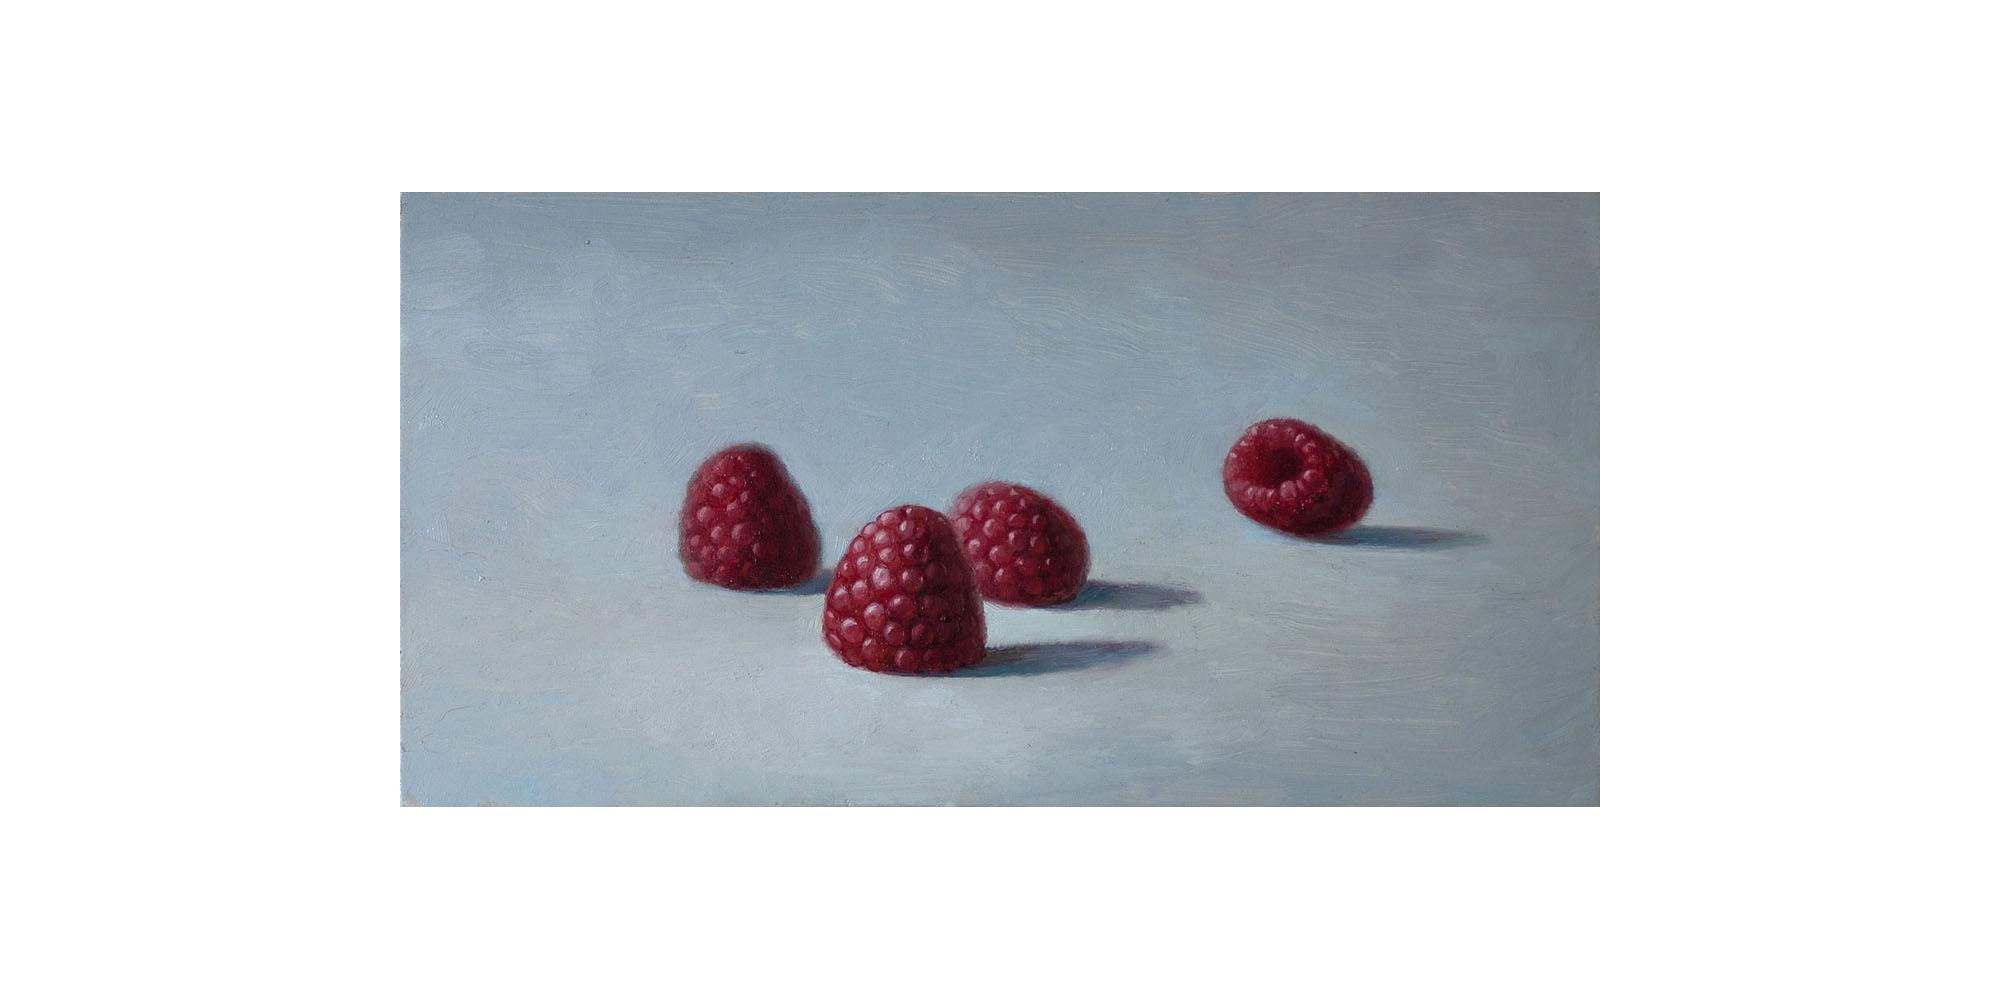 Four Raspberries